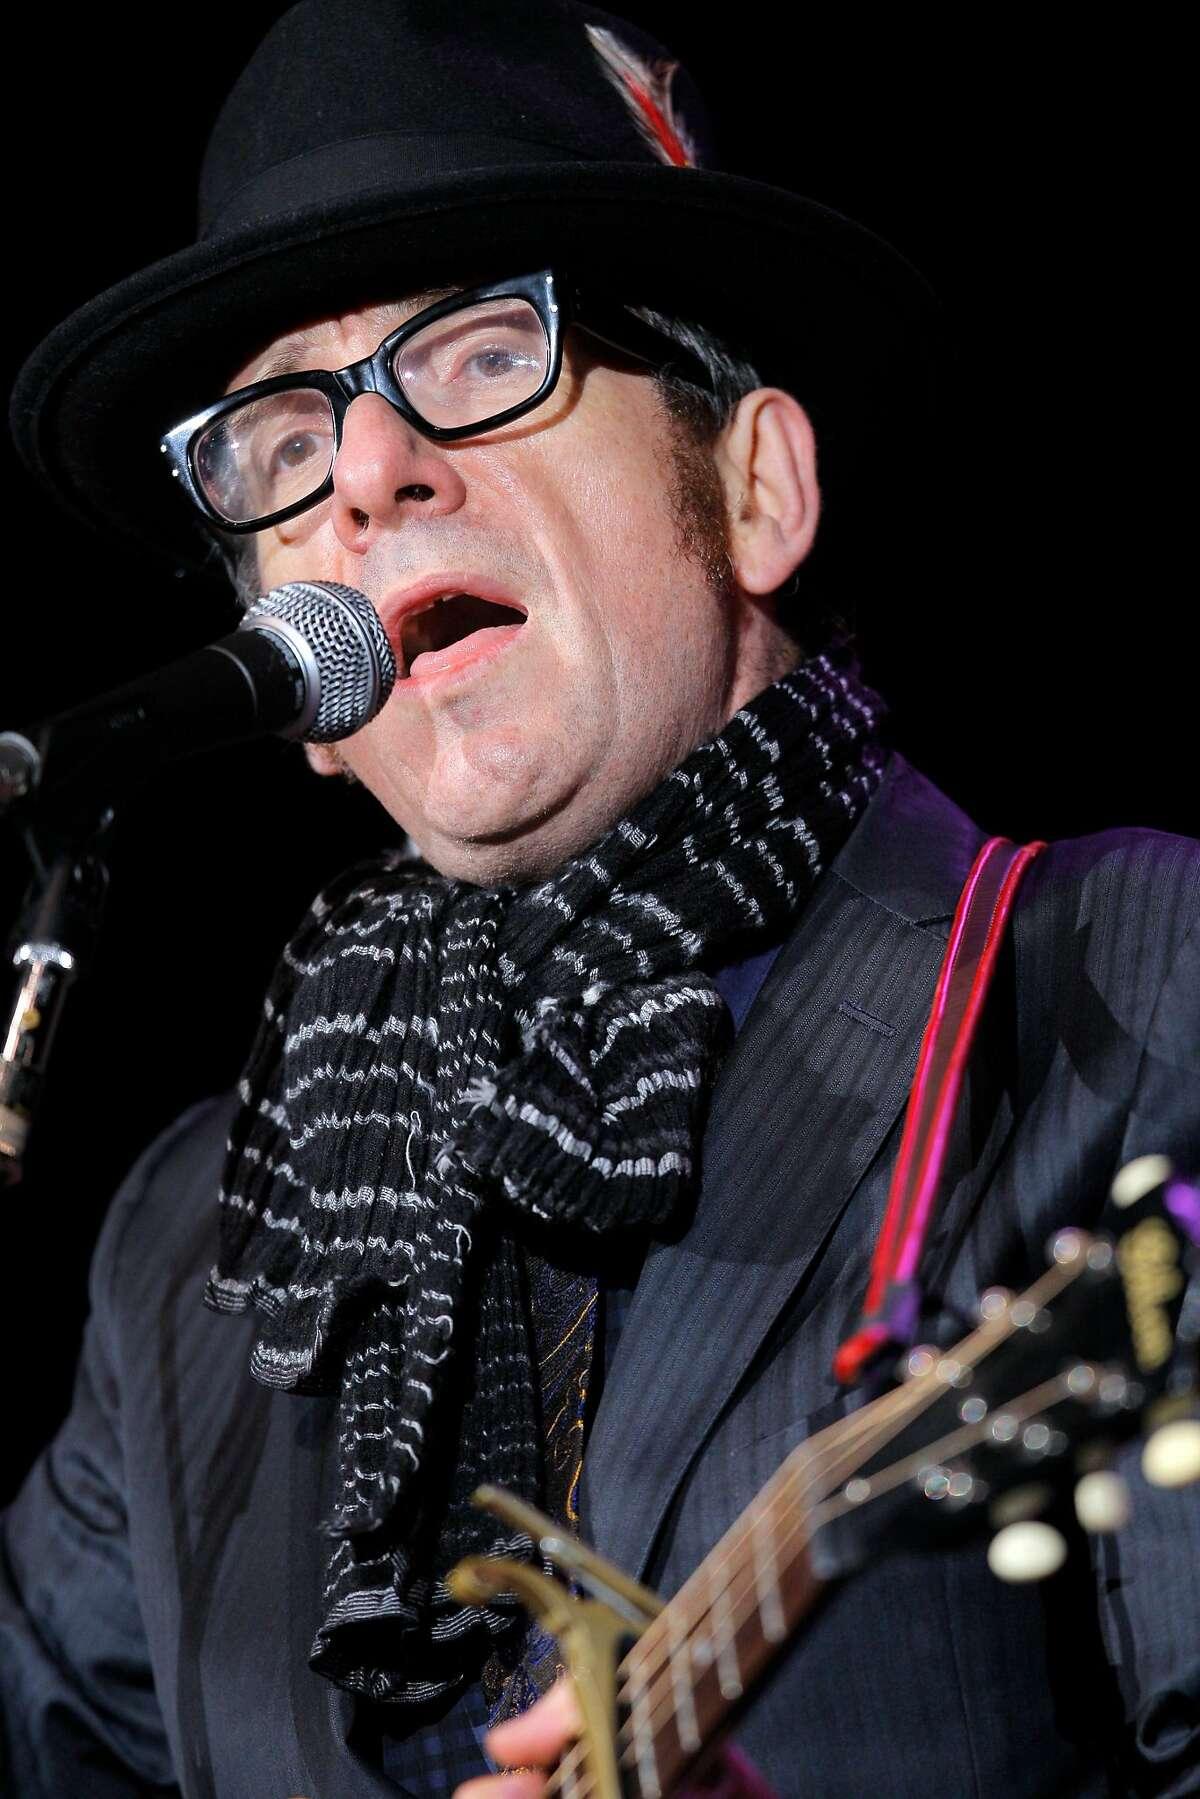 Elvis Costello performs during Neil Young's annual Bridge School Benefit concert at Shoreline Amphitheatre Saturday, October 23, 2010, Mountain View, Calif.